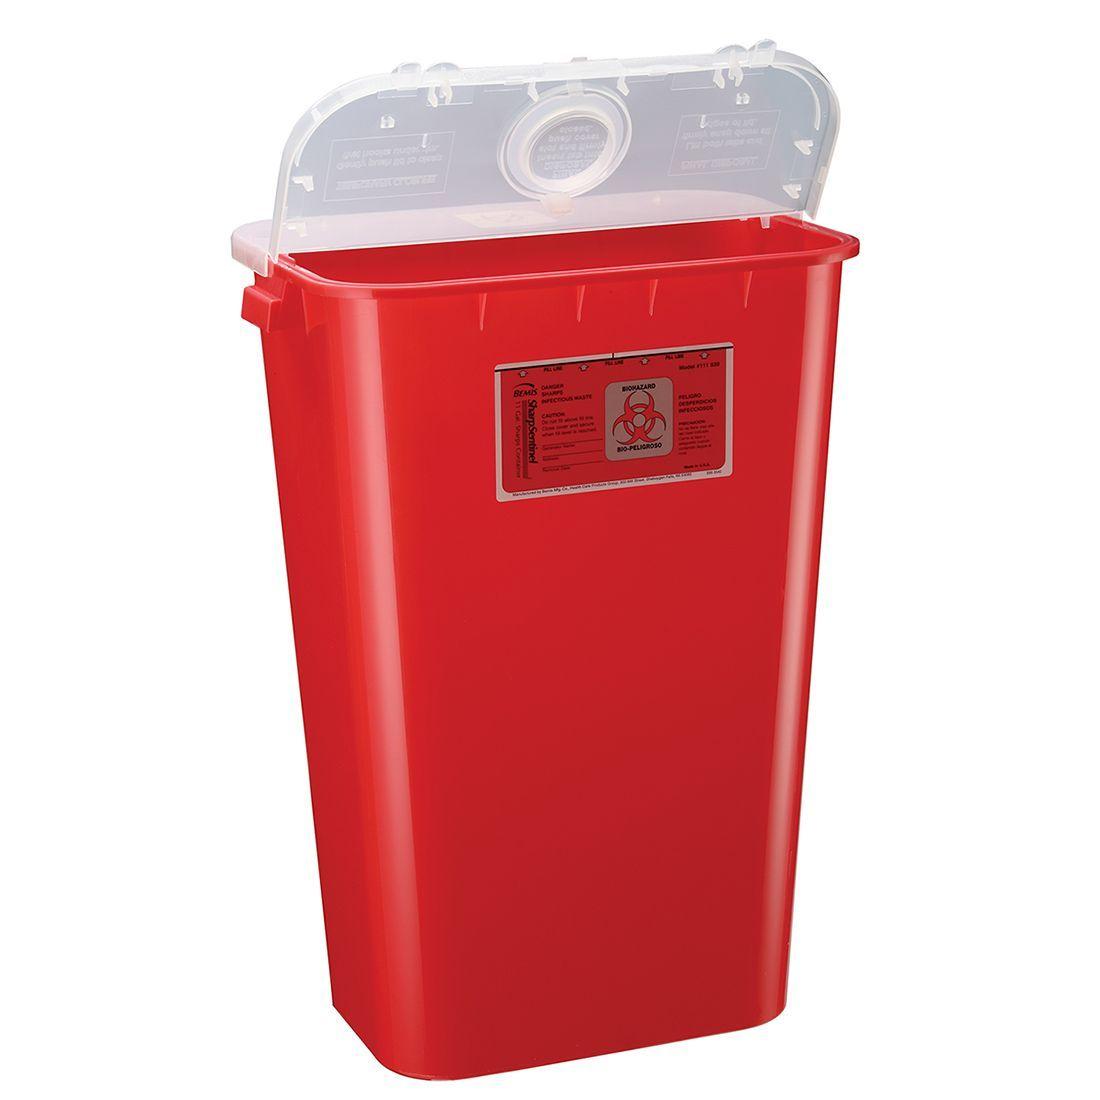 Bemis SharpSentinel 11-Gallon Sharps Container (6/Case)